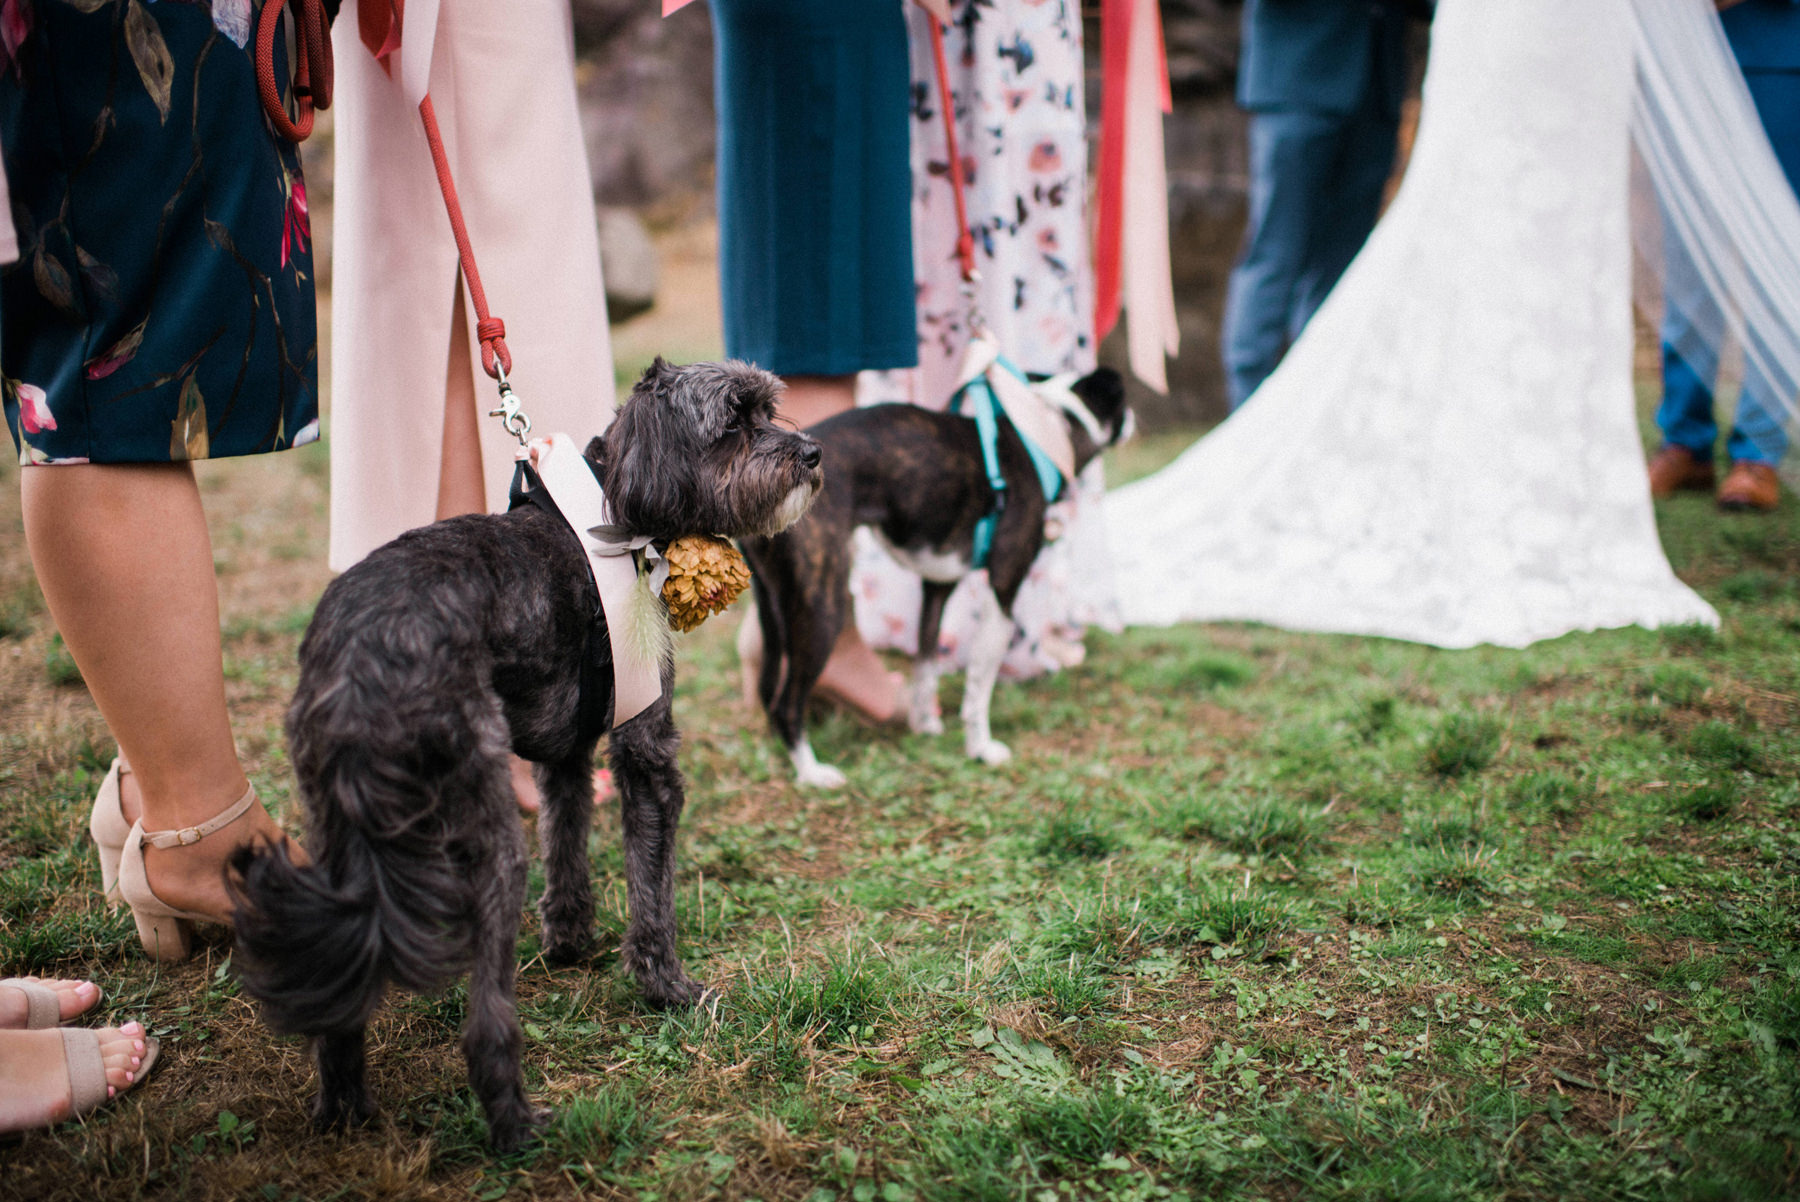 321-colorful-outdoor-lopez-island-wedding.jpg